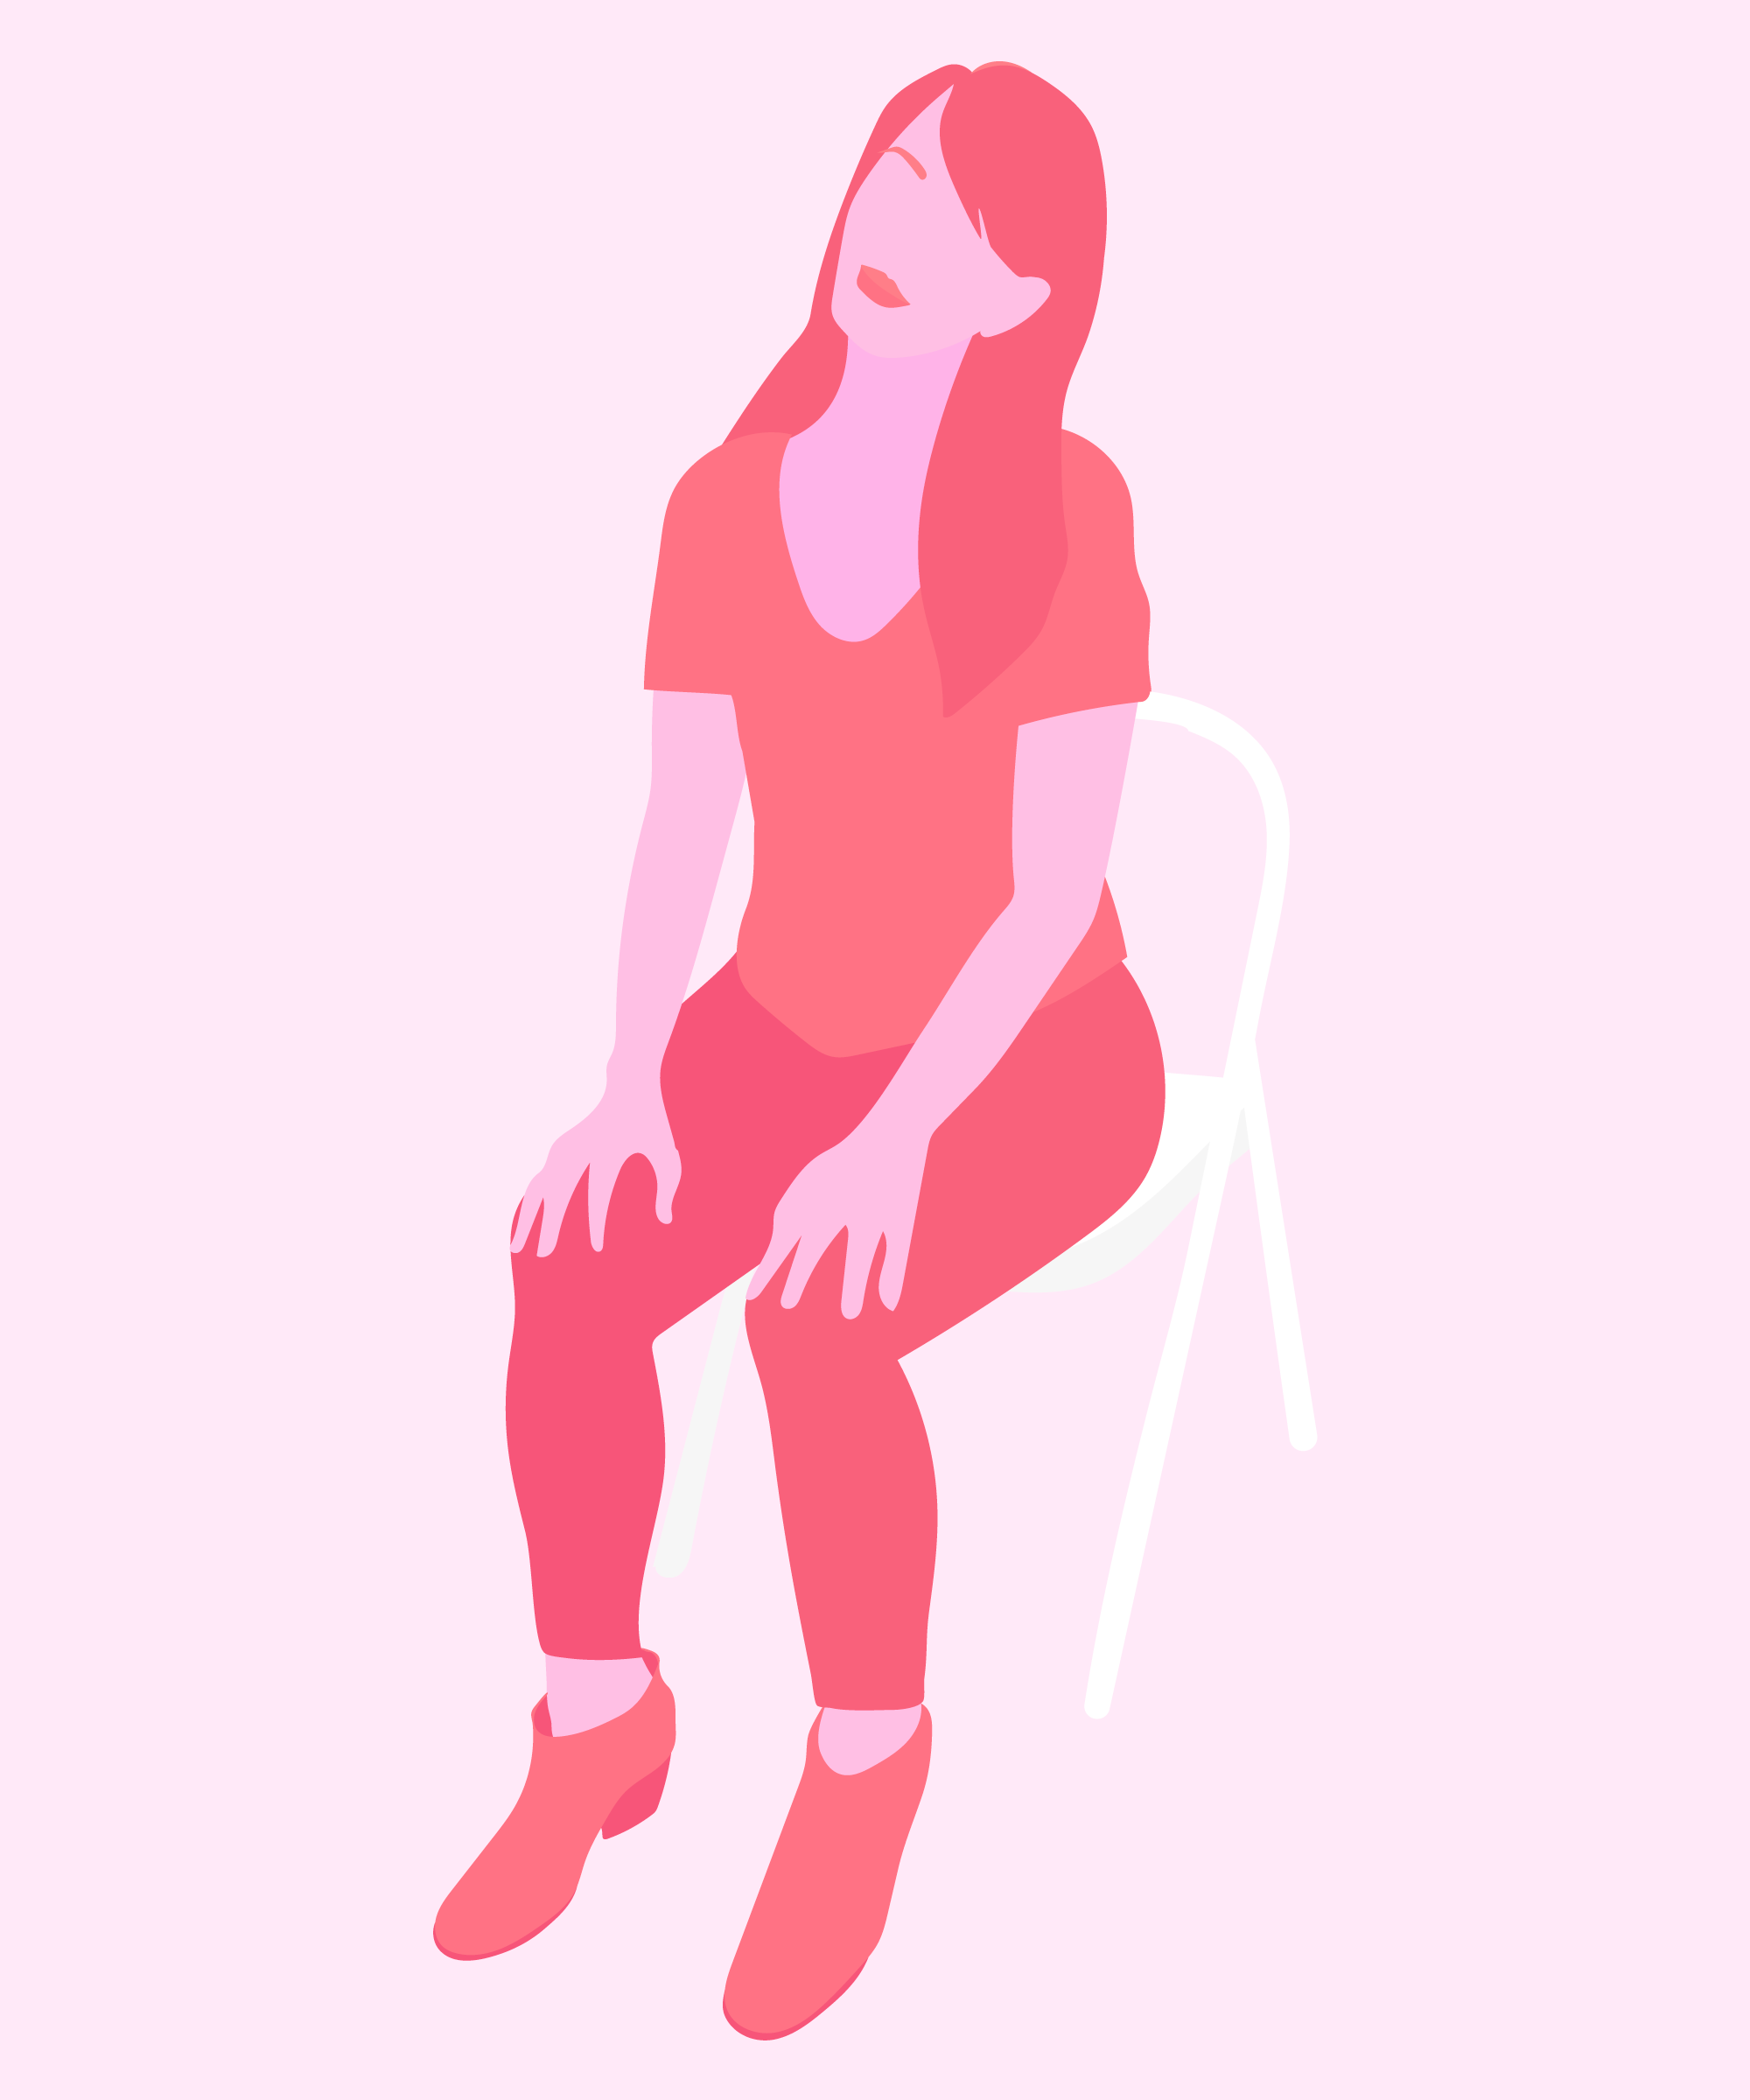 Desk Yoga Stretches - Back Stretching Posture Exercises